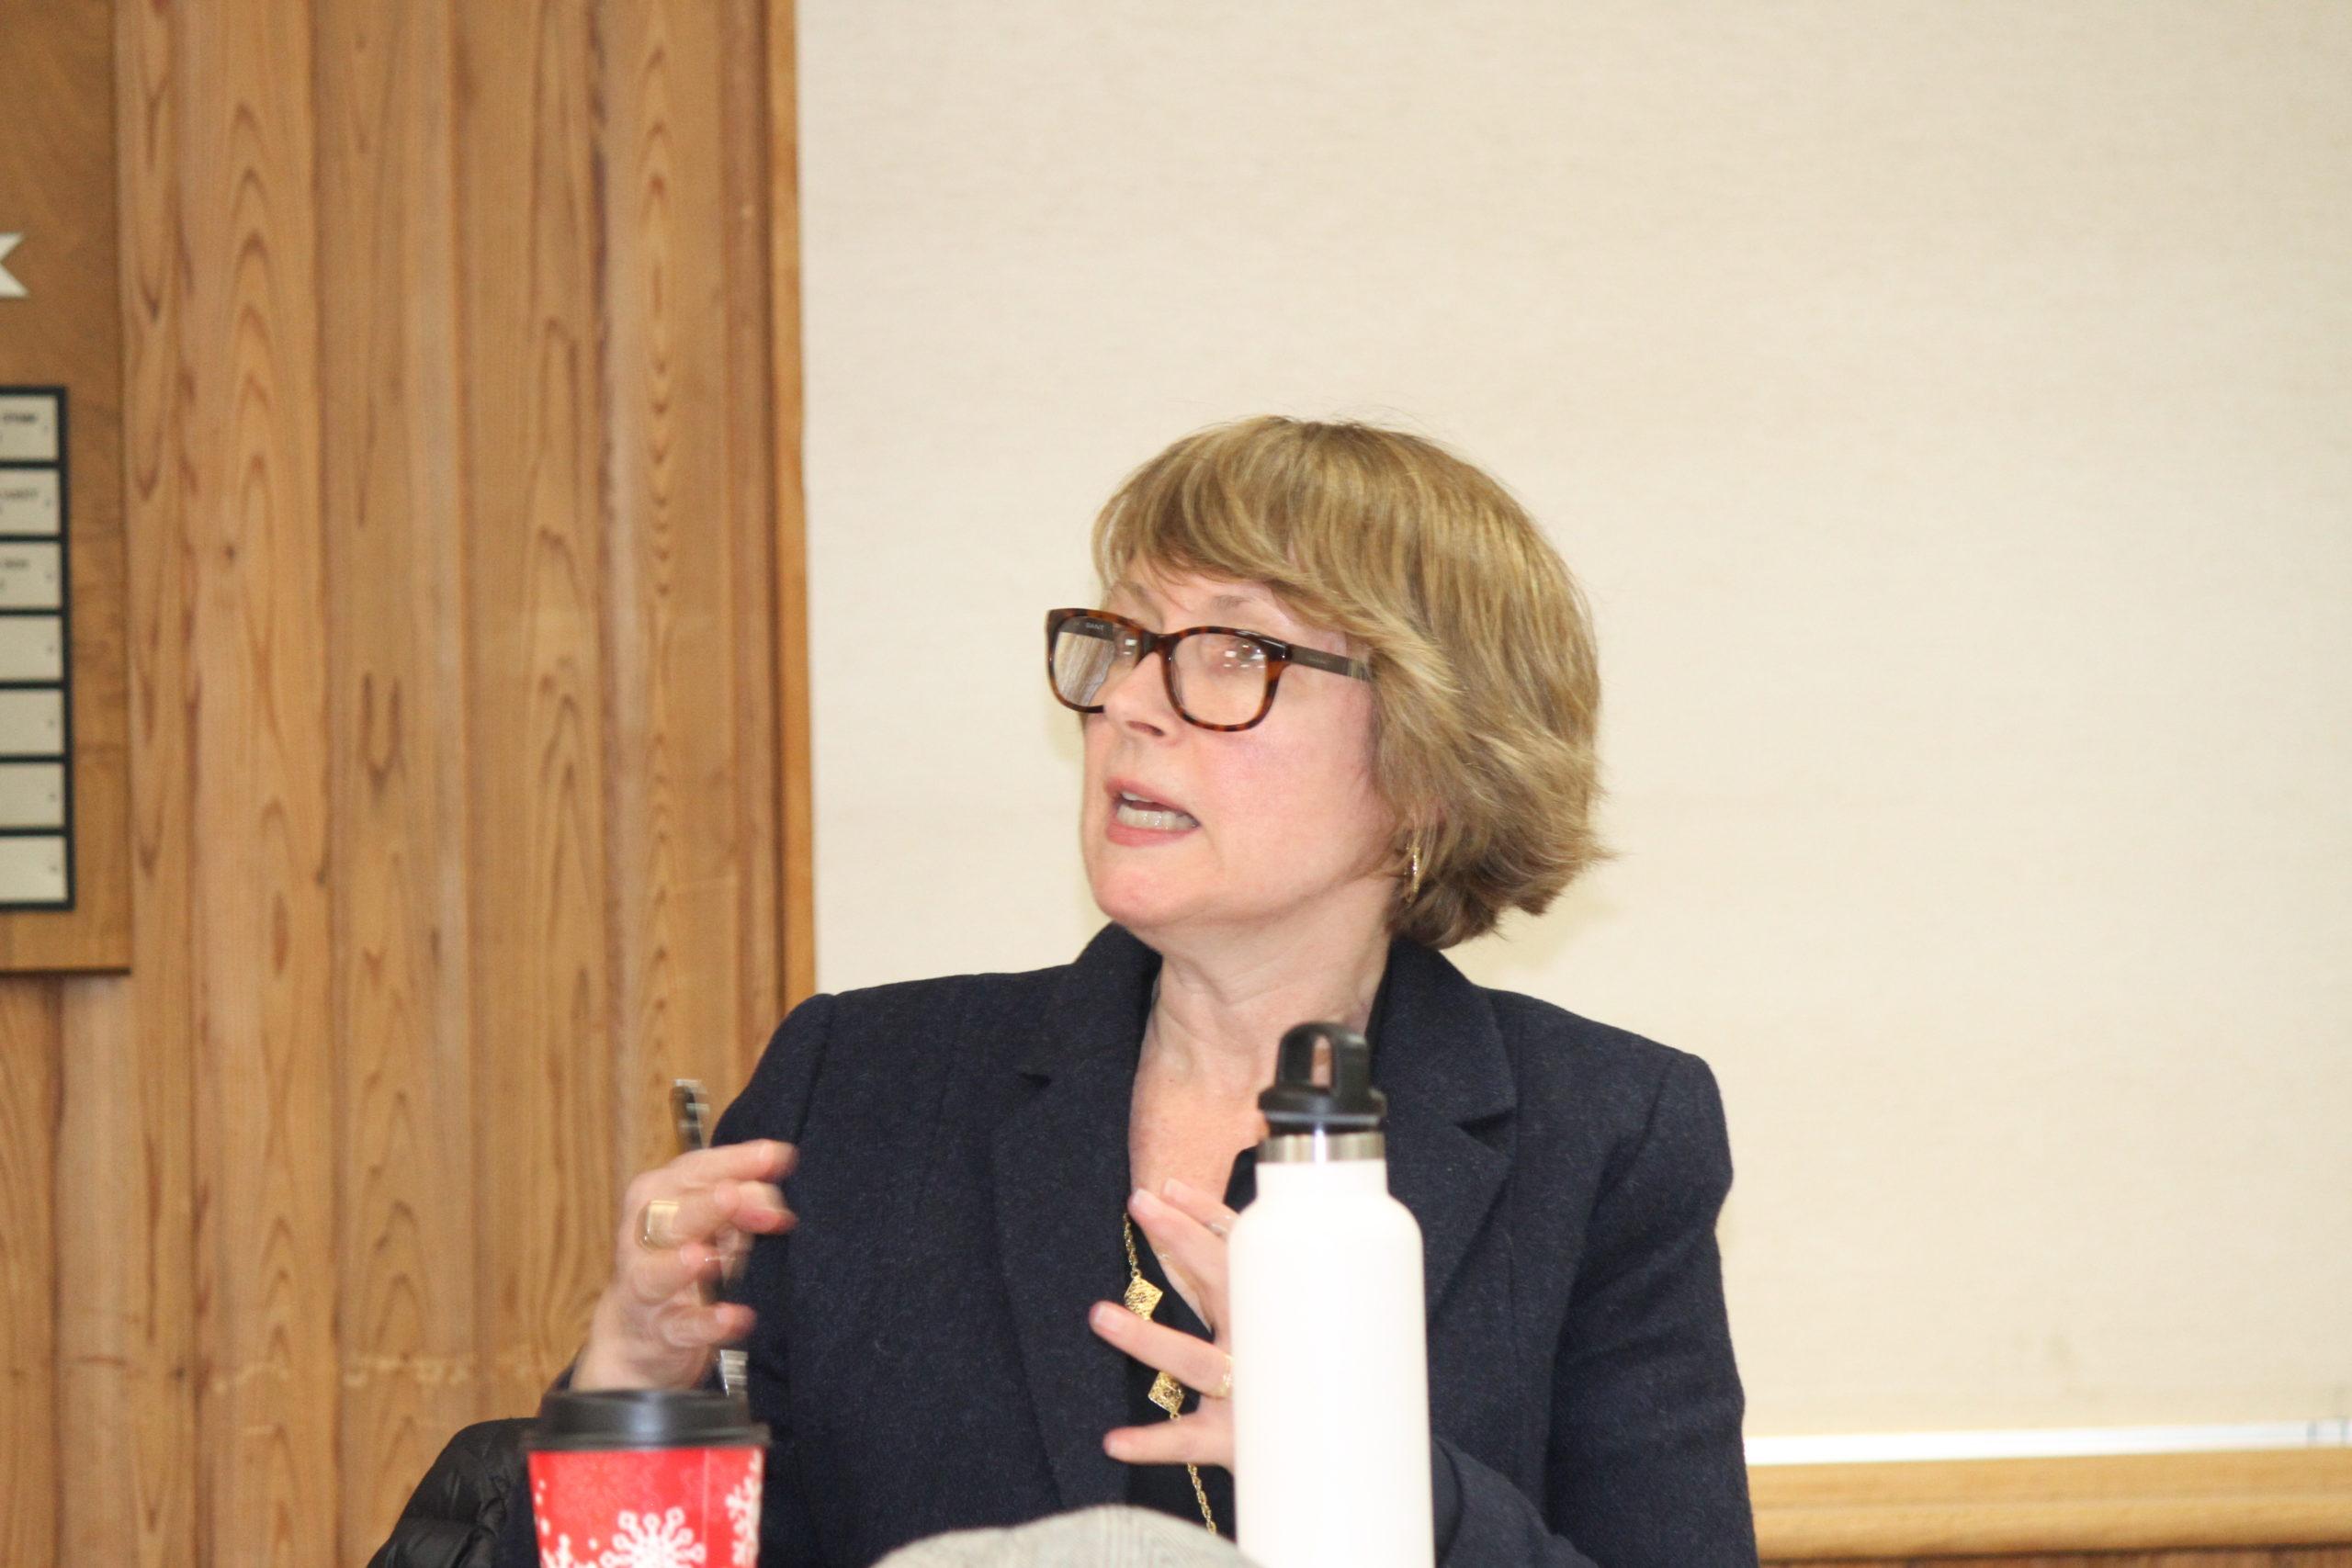 Councilwoman Kathee Burke-Gonzalez